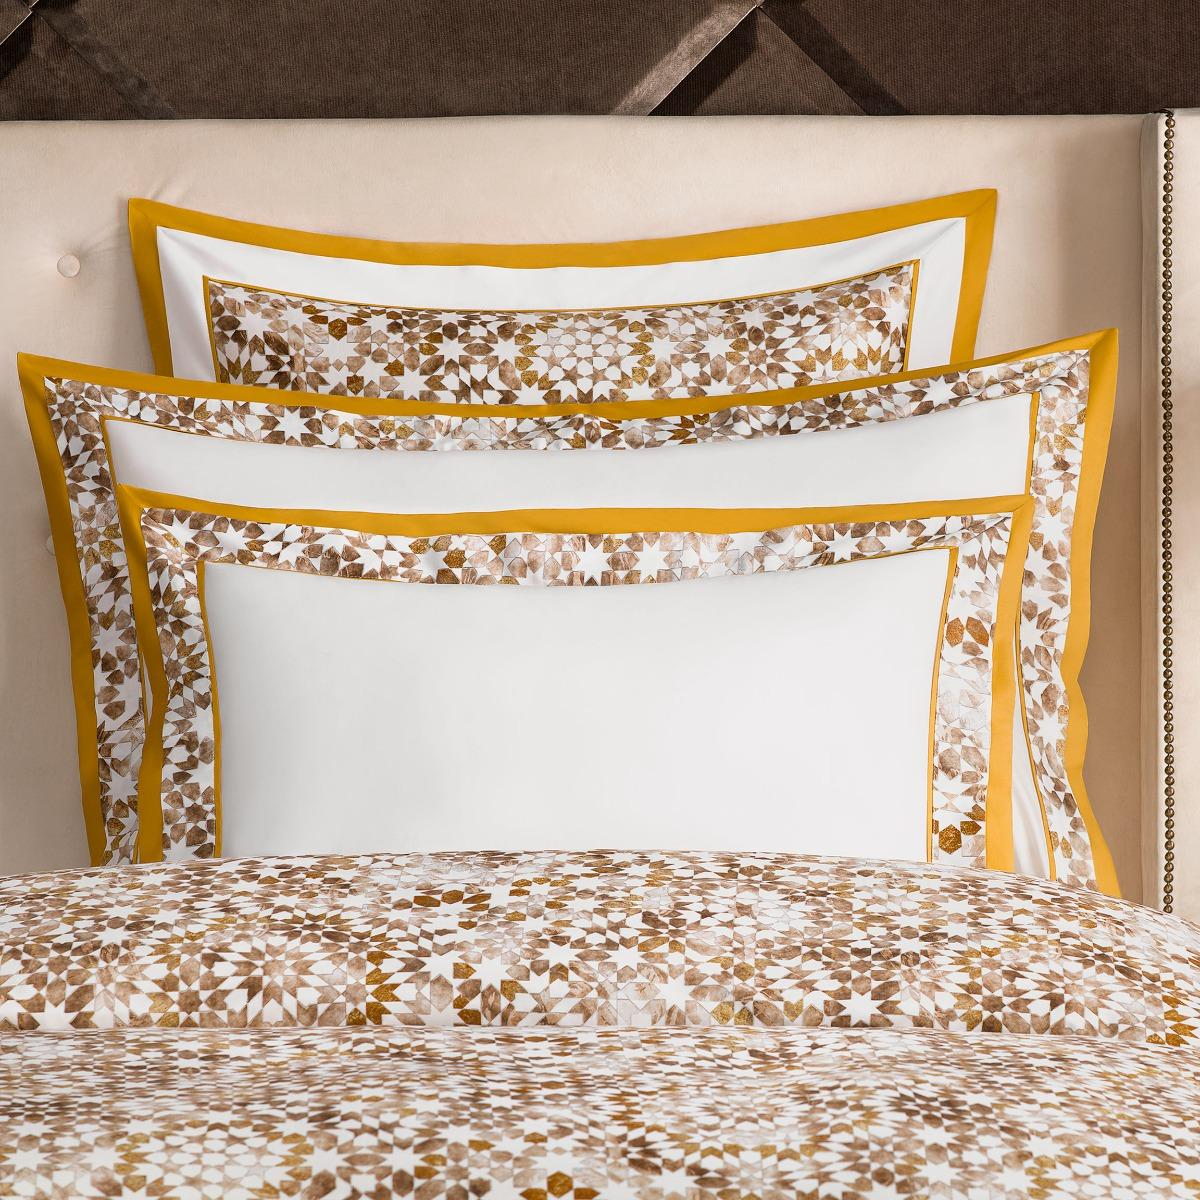 Фото - Наволочек комплект Togas нурим оранжевый 50х90. 2 пр постельный комплект togas нурим оранжевый 145x200 200х230 50х70 2